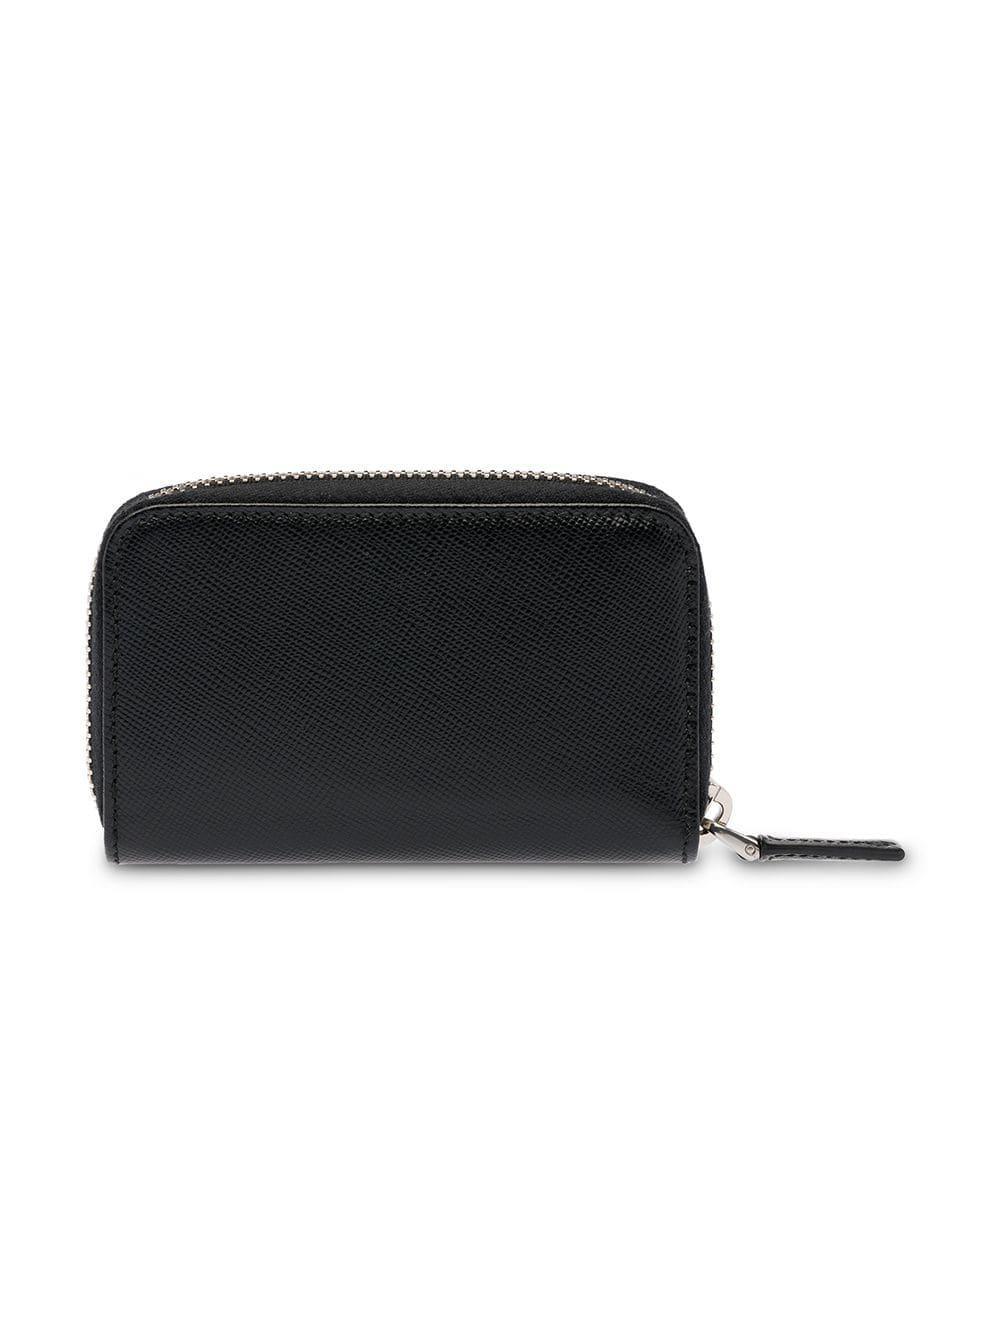 c1cf845a65 Lyst - Prada Saffiano Leather Padlock Holder in Black